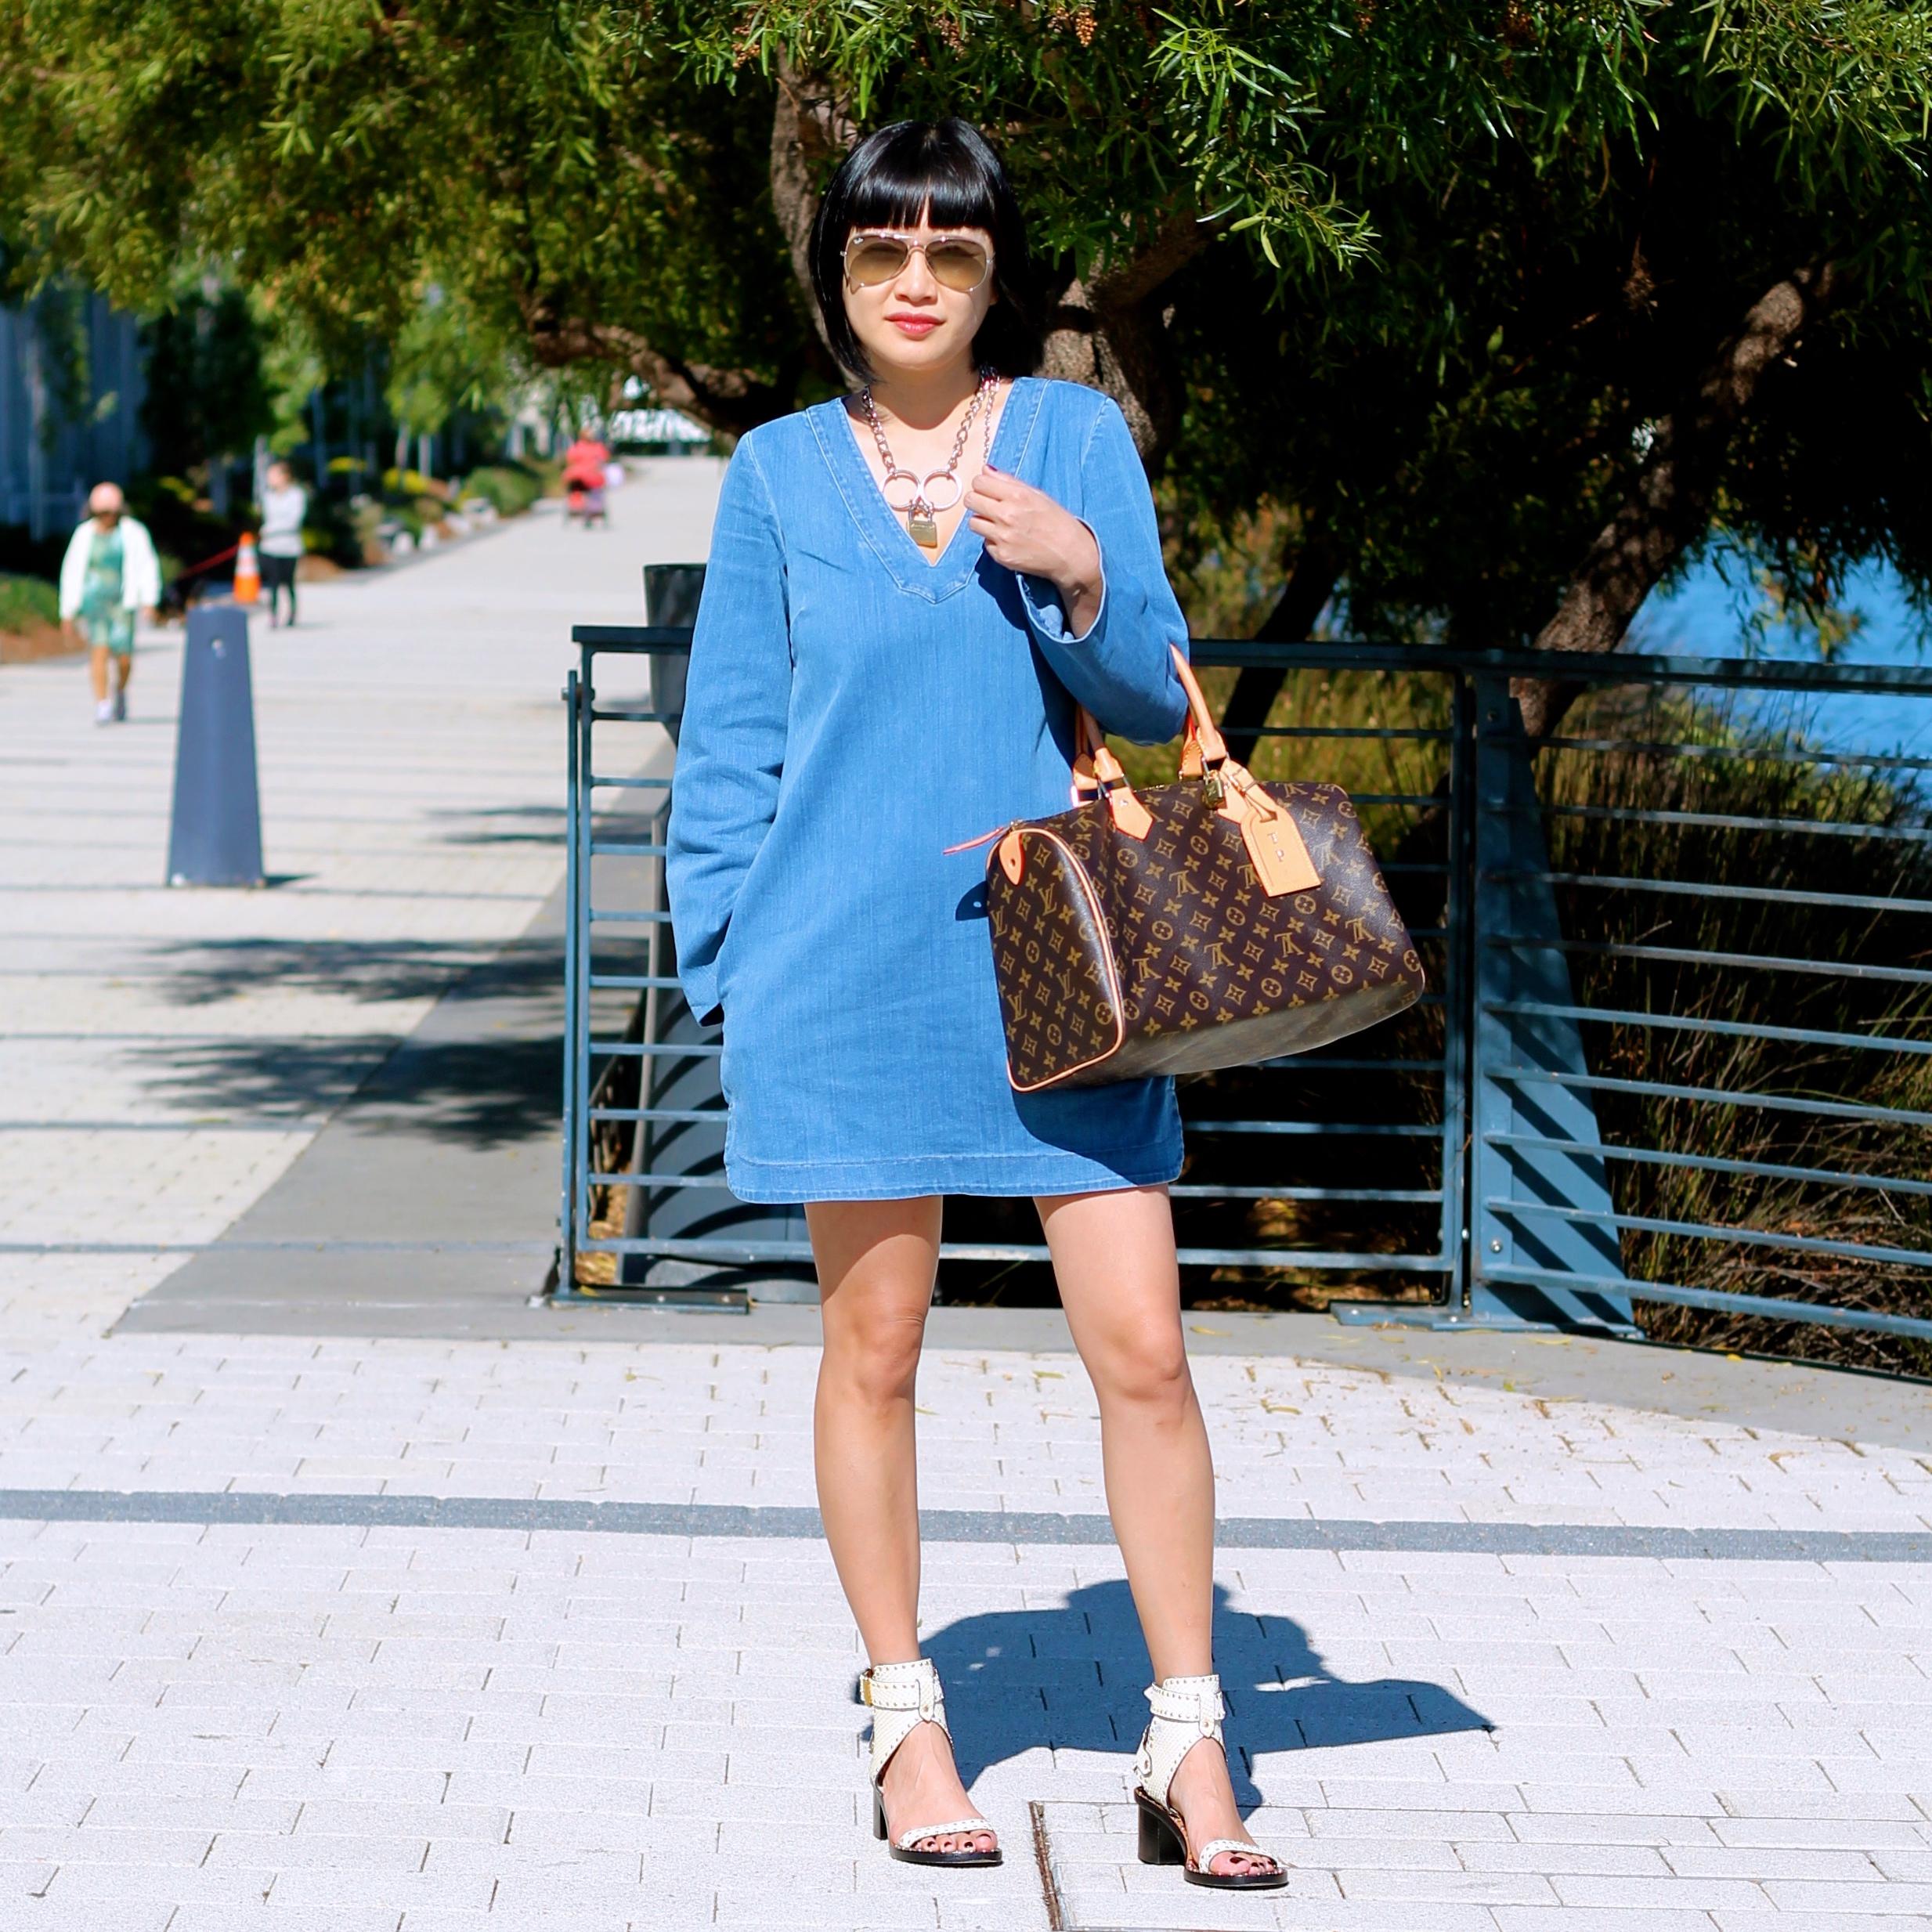 NC dress, Isabel Marant shoes, Louis Vuitton bag, Ray-Ban sunglasses